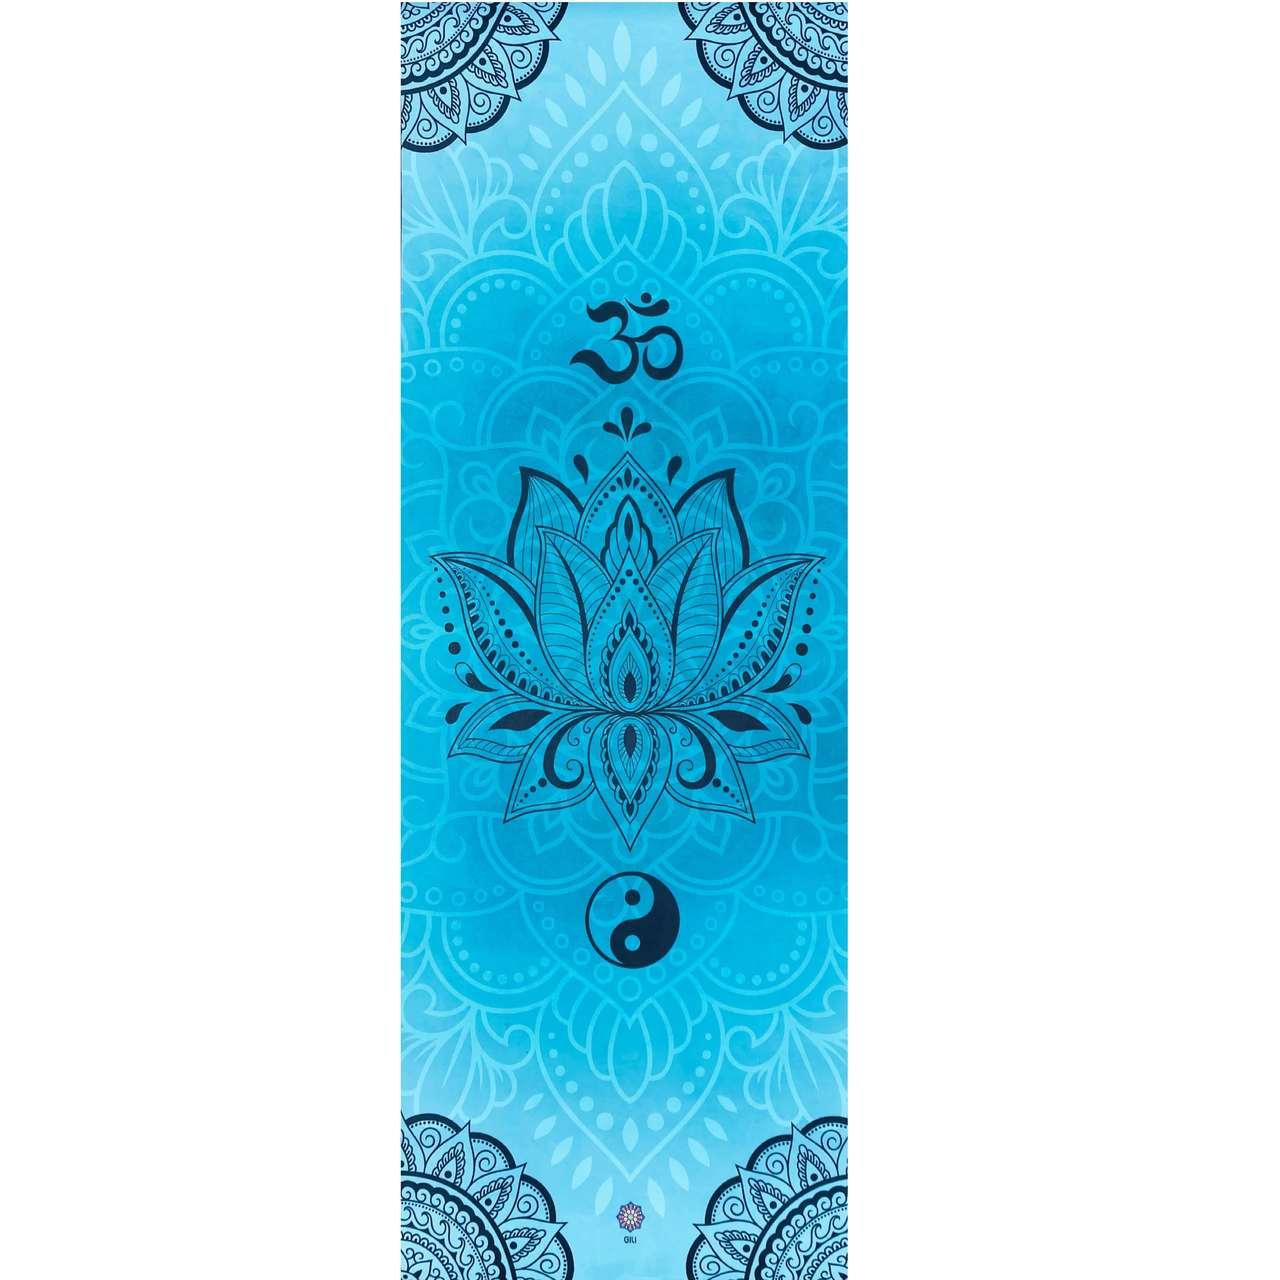 Tapete de Yoga Estampado Aveludado - Om Lótus Yin Yang